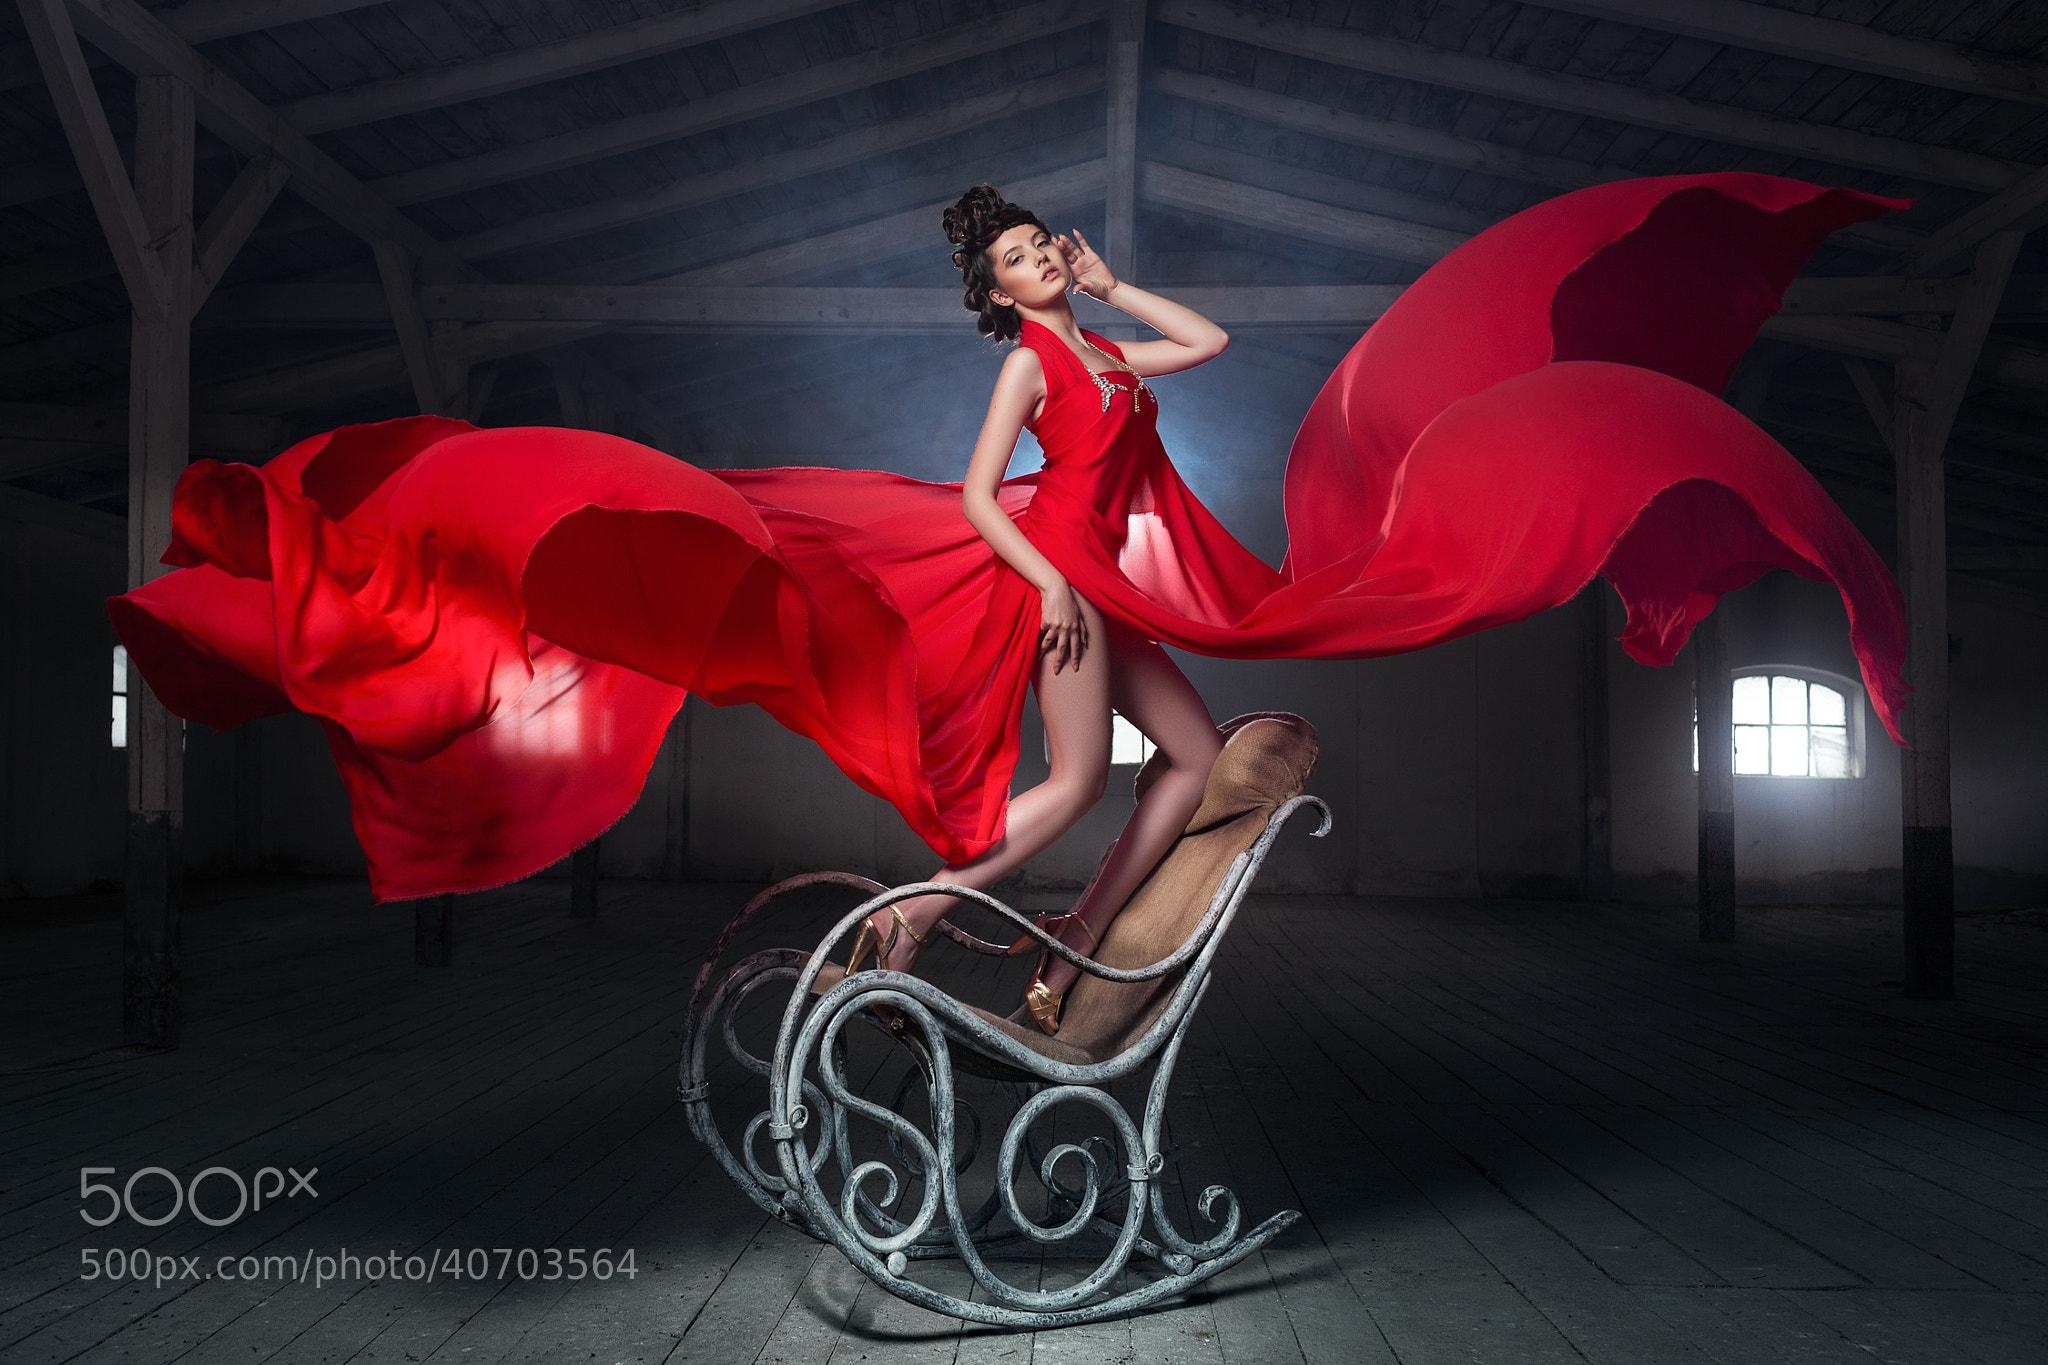 Photograph Libra by Daniel Ilinca on 500px